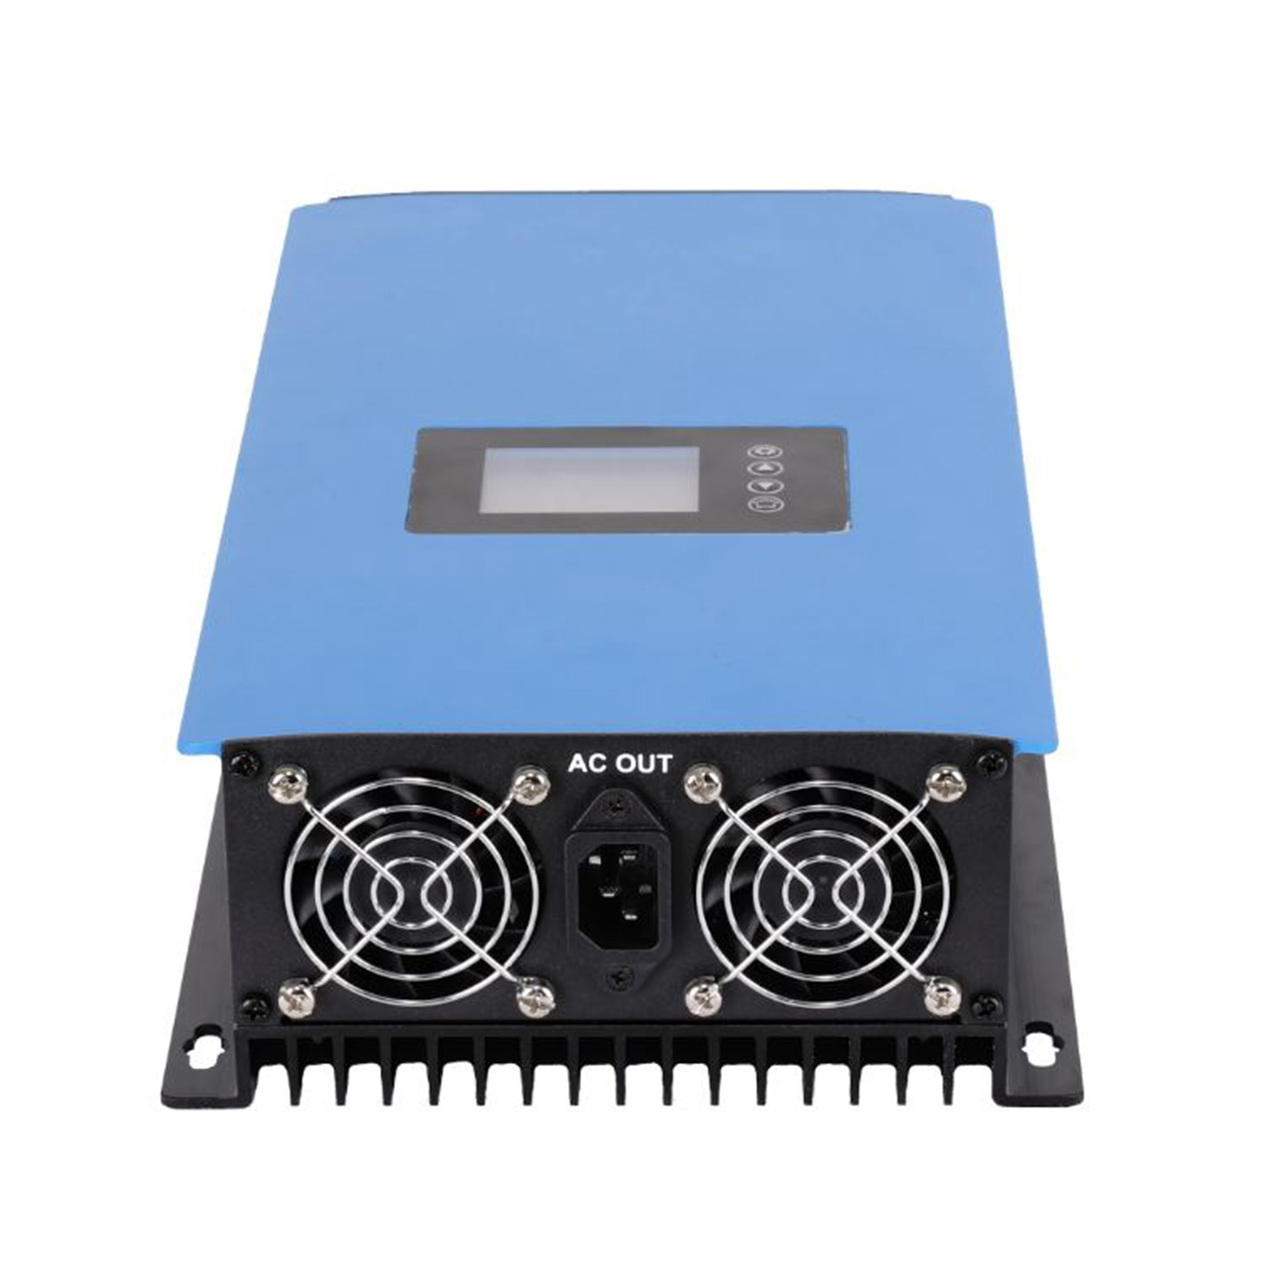 Grid Tie Inverter 1000 Watt with Dump Load for 3 Phase AC Wind Turbine Grid Tie Inverter 24v 48V Input MPPT Pure Sine Wave